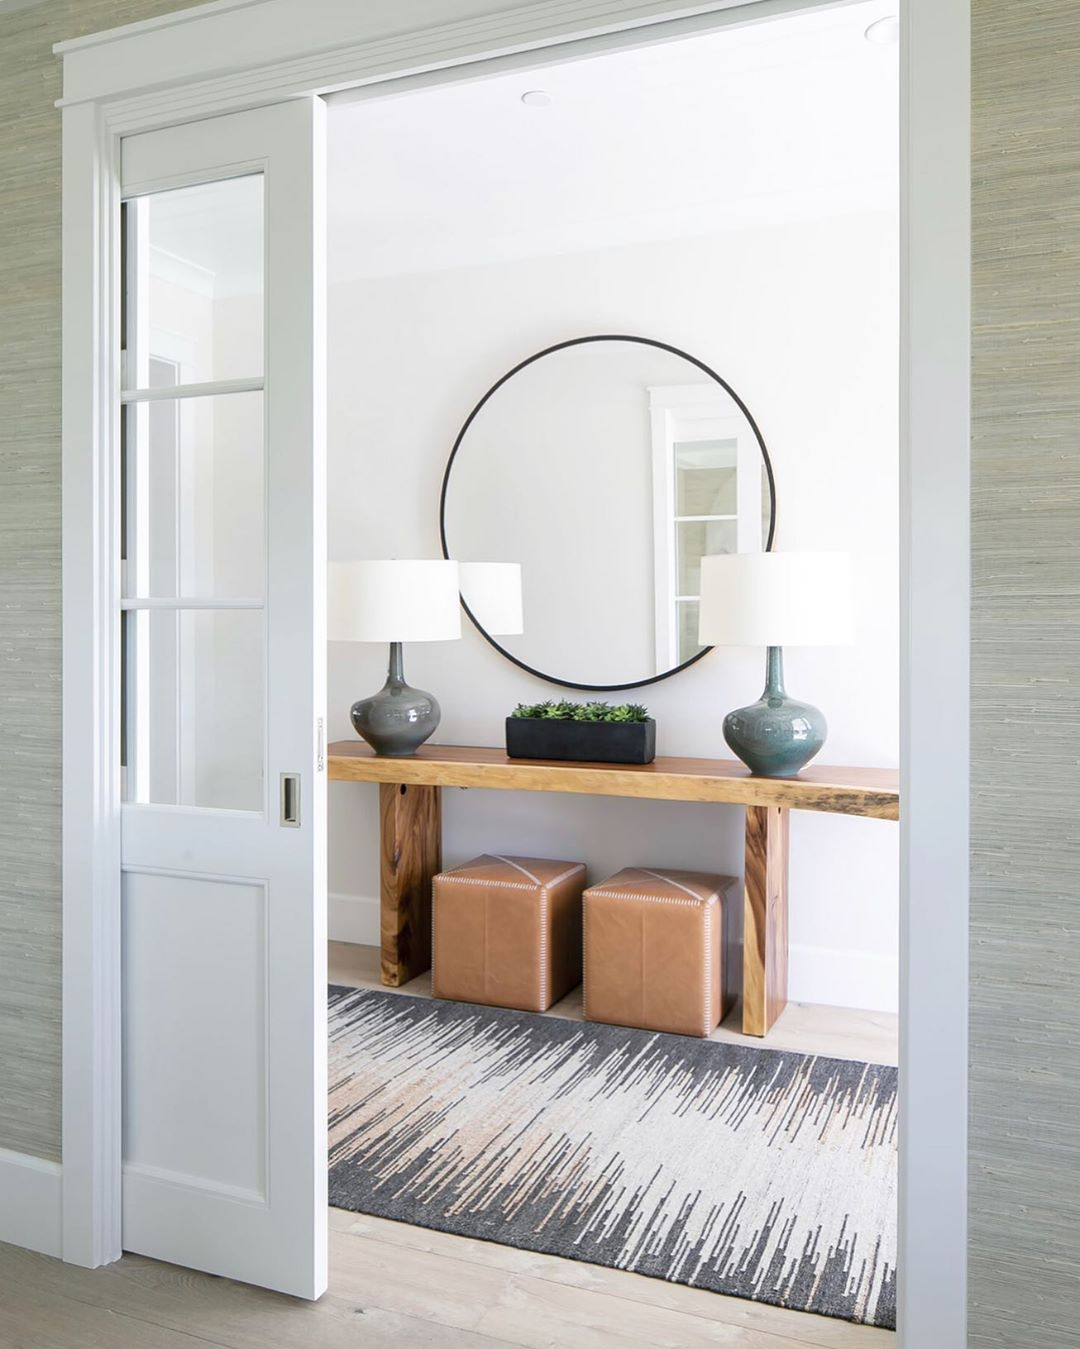 "Brooke Wagner Design on Instagram: ""I love a simple and timeless entry ♡ #entrygoals #interiordesign #neutraldecor #interiorstyled #bwd Builder @marstonbuilders  Architect…"""